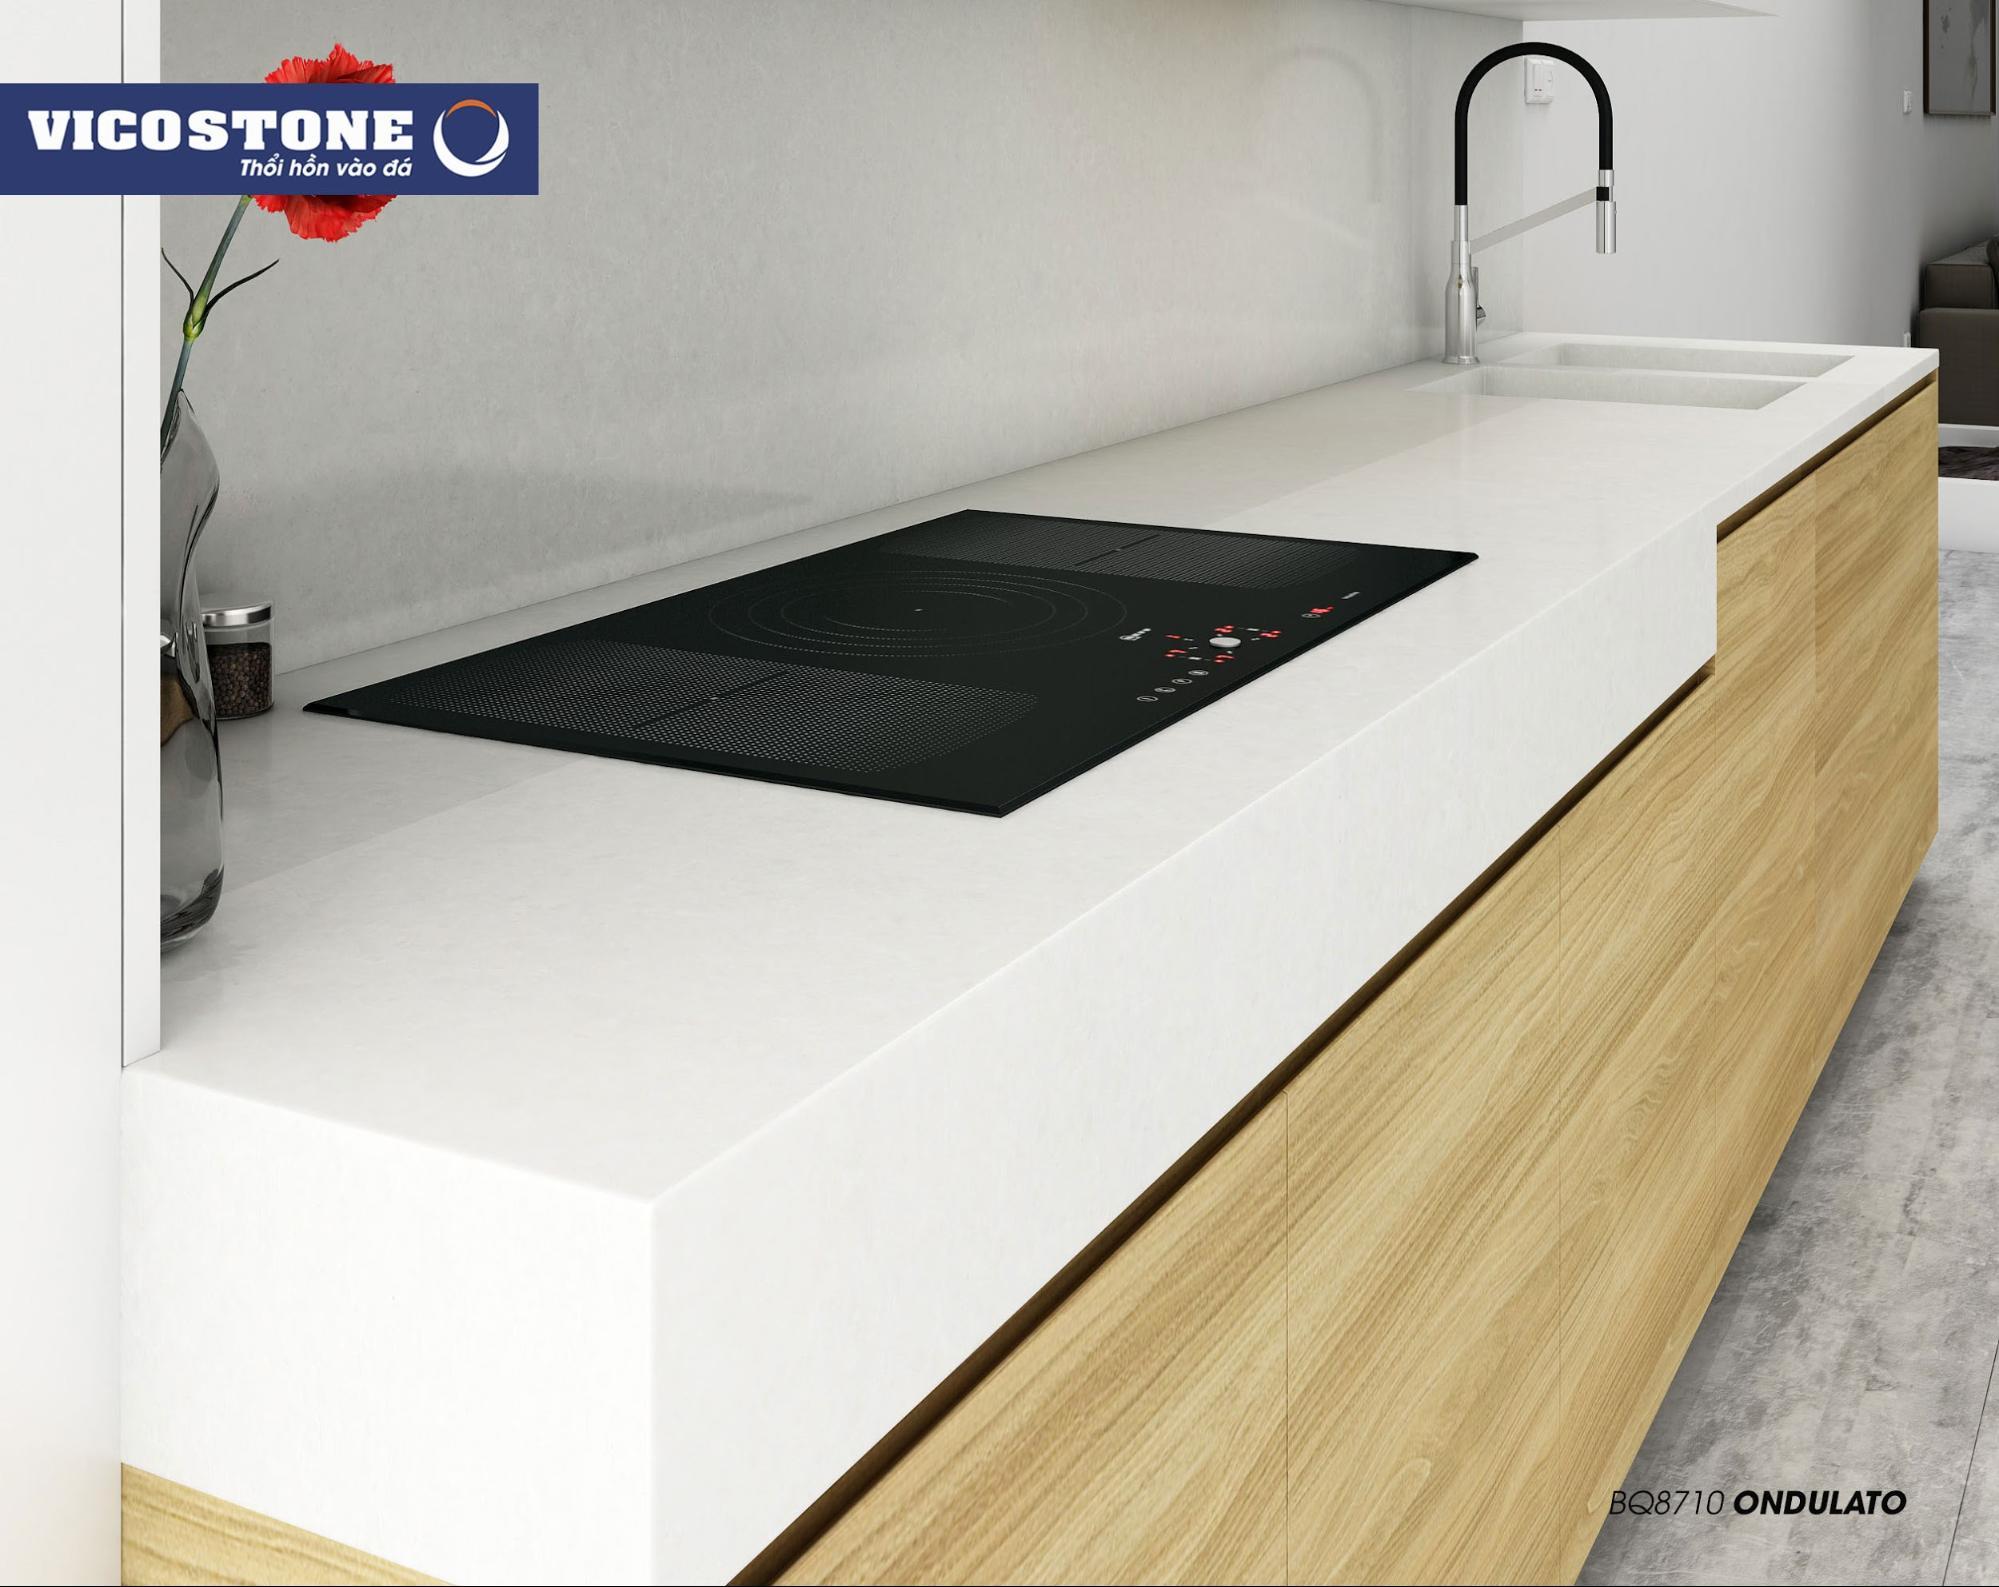 Mẫu đá bàn bếp VICOSTONE Ondulato BQ8710